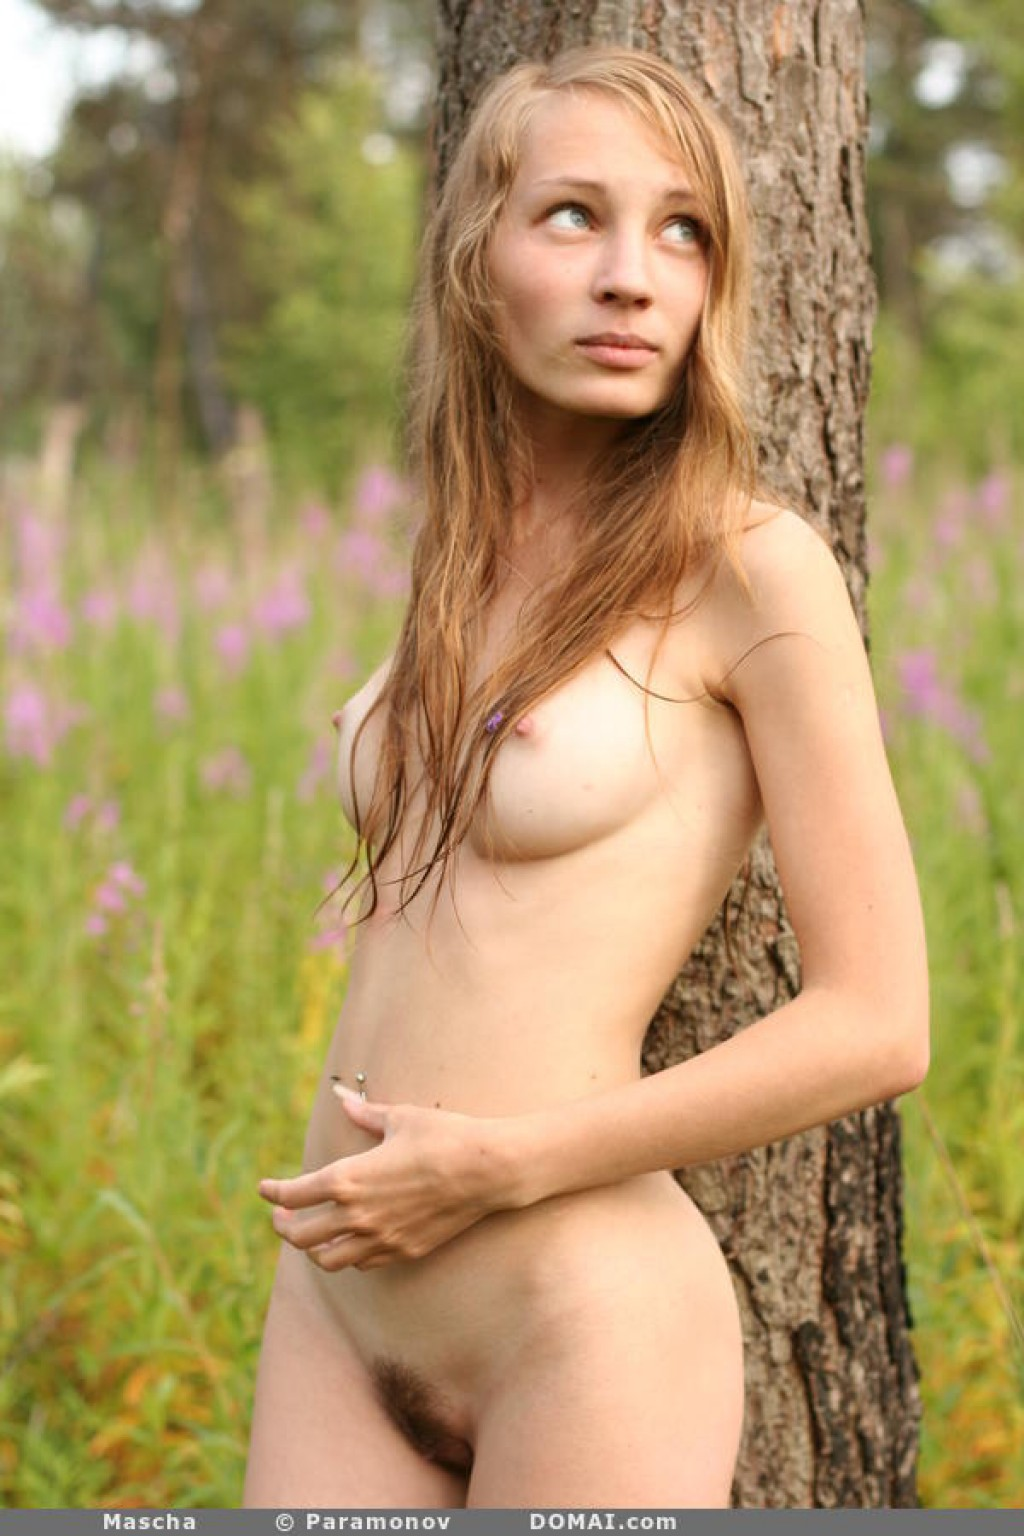 Indefinitely mascha domai nude model have forgotten